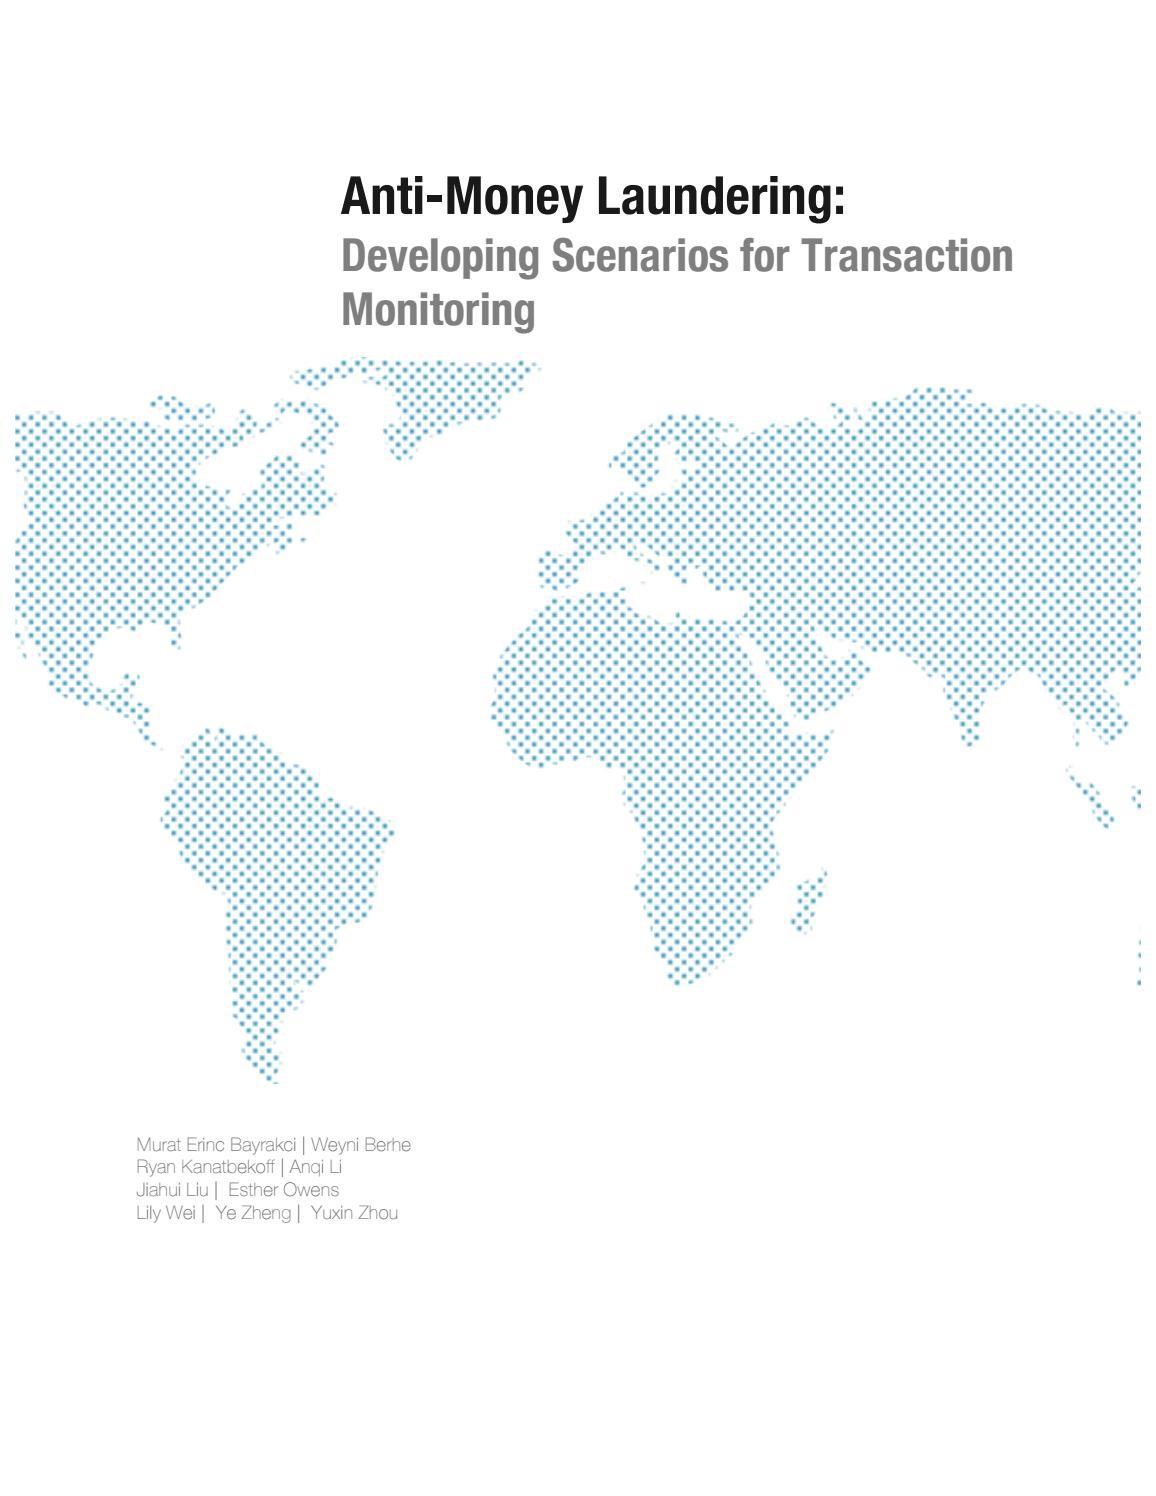 Anti Money Laundering Infographic Gamblingcompliance